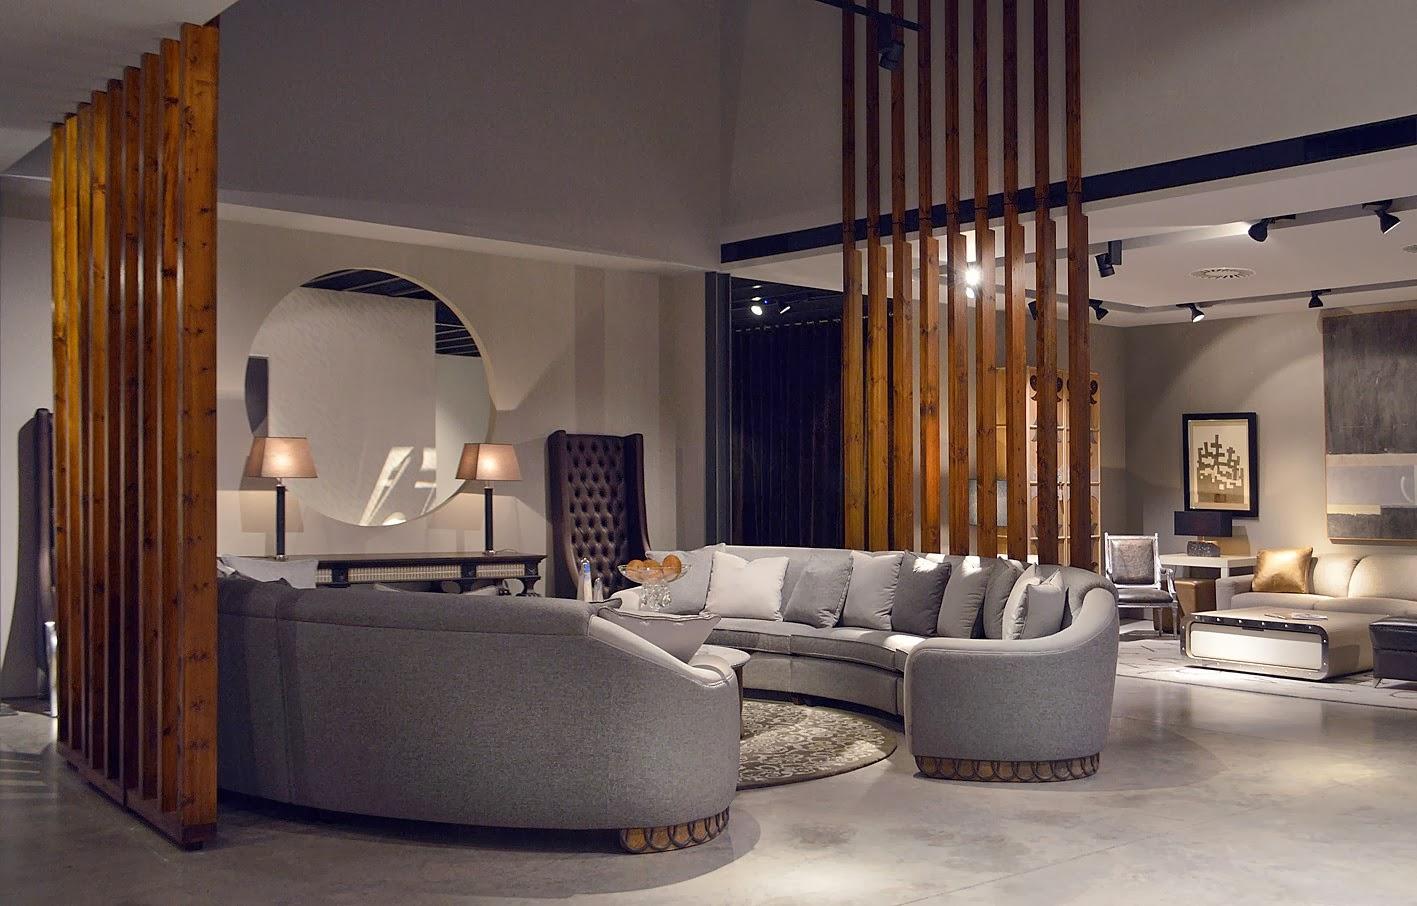 Dcoarte brasil colecci n alexandra inaugura su nuevo for Muebles alta decoracion